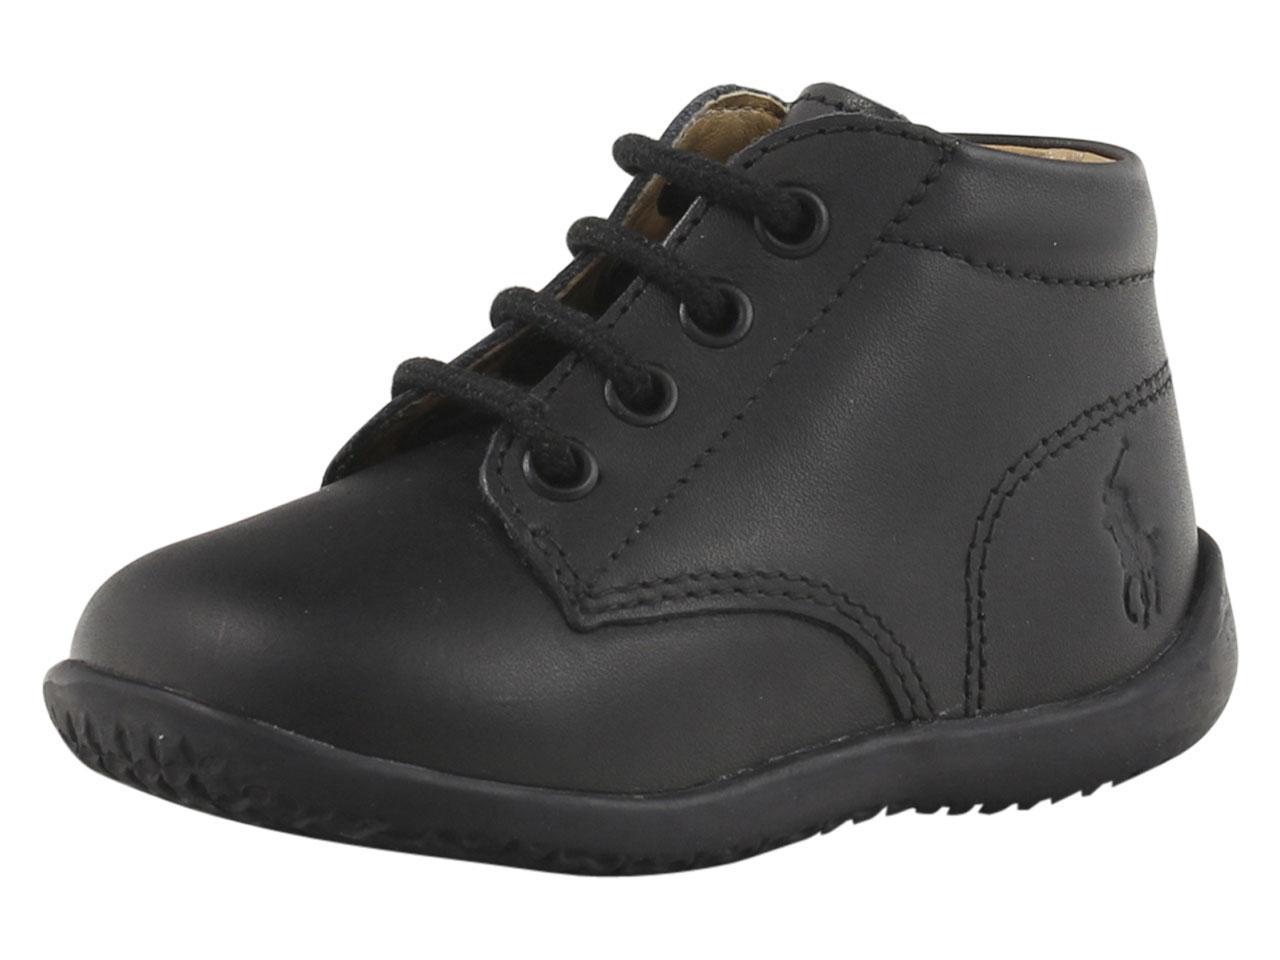 Top Ralph Lauren Boy's High Shoes Kinley Toddler Polo Sneakers J1lFKc